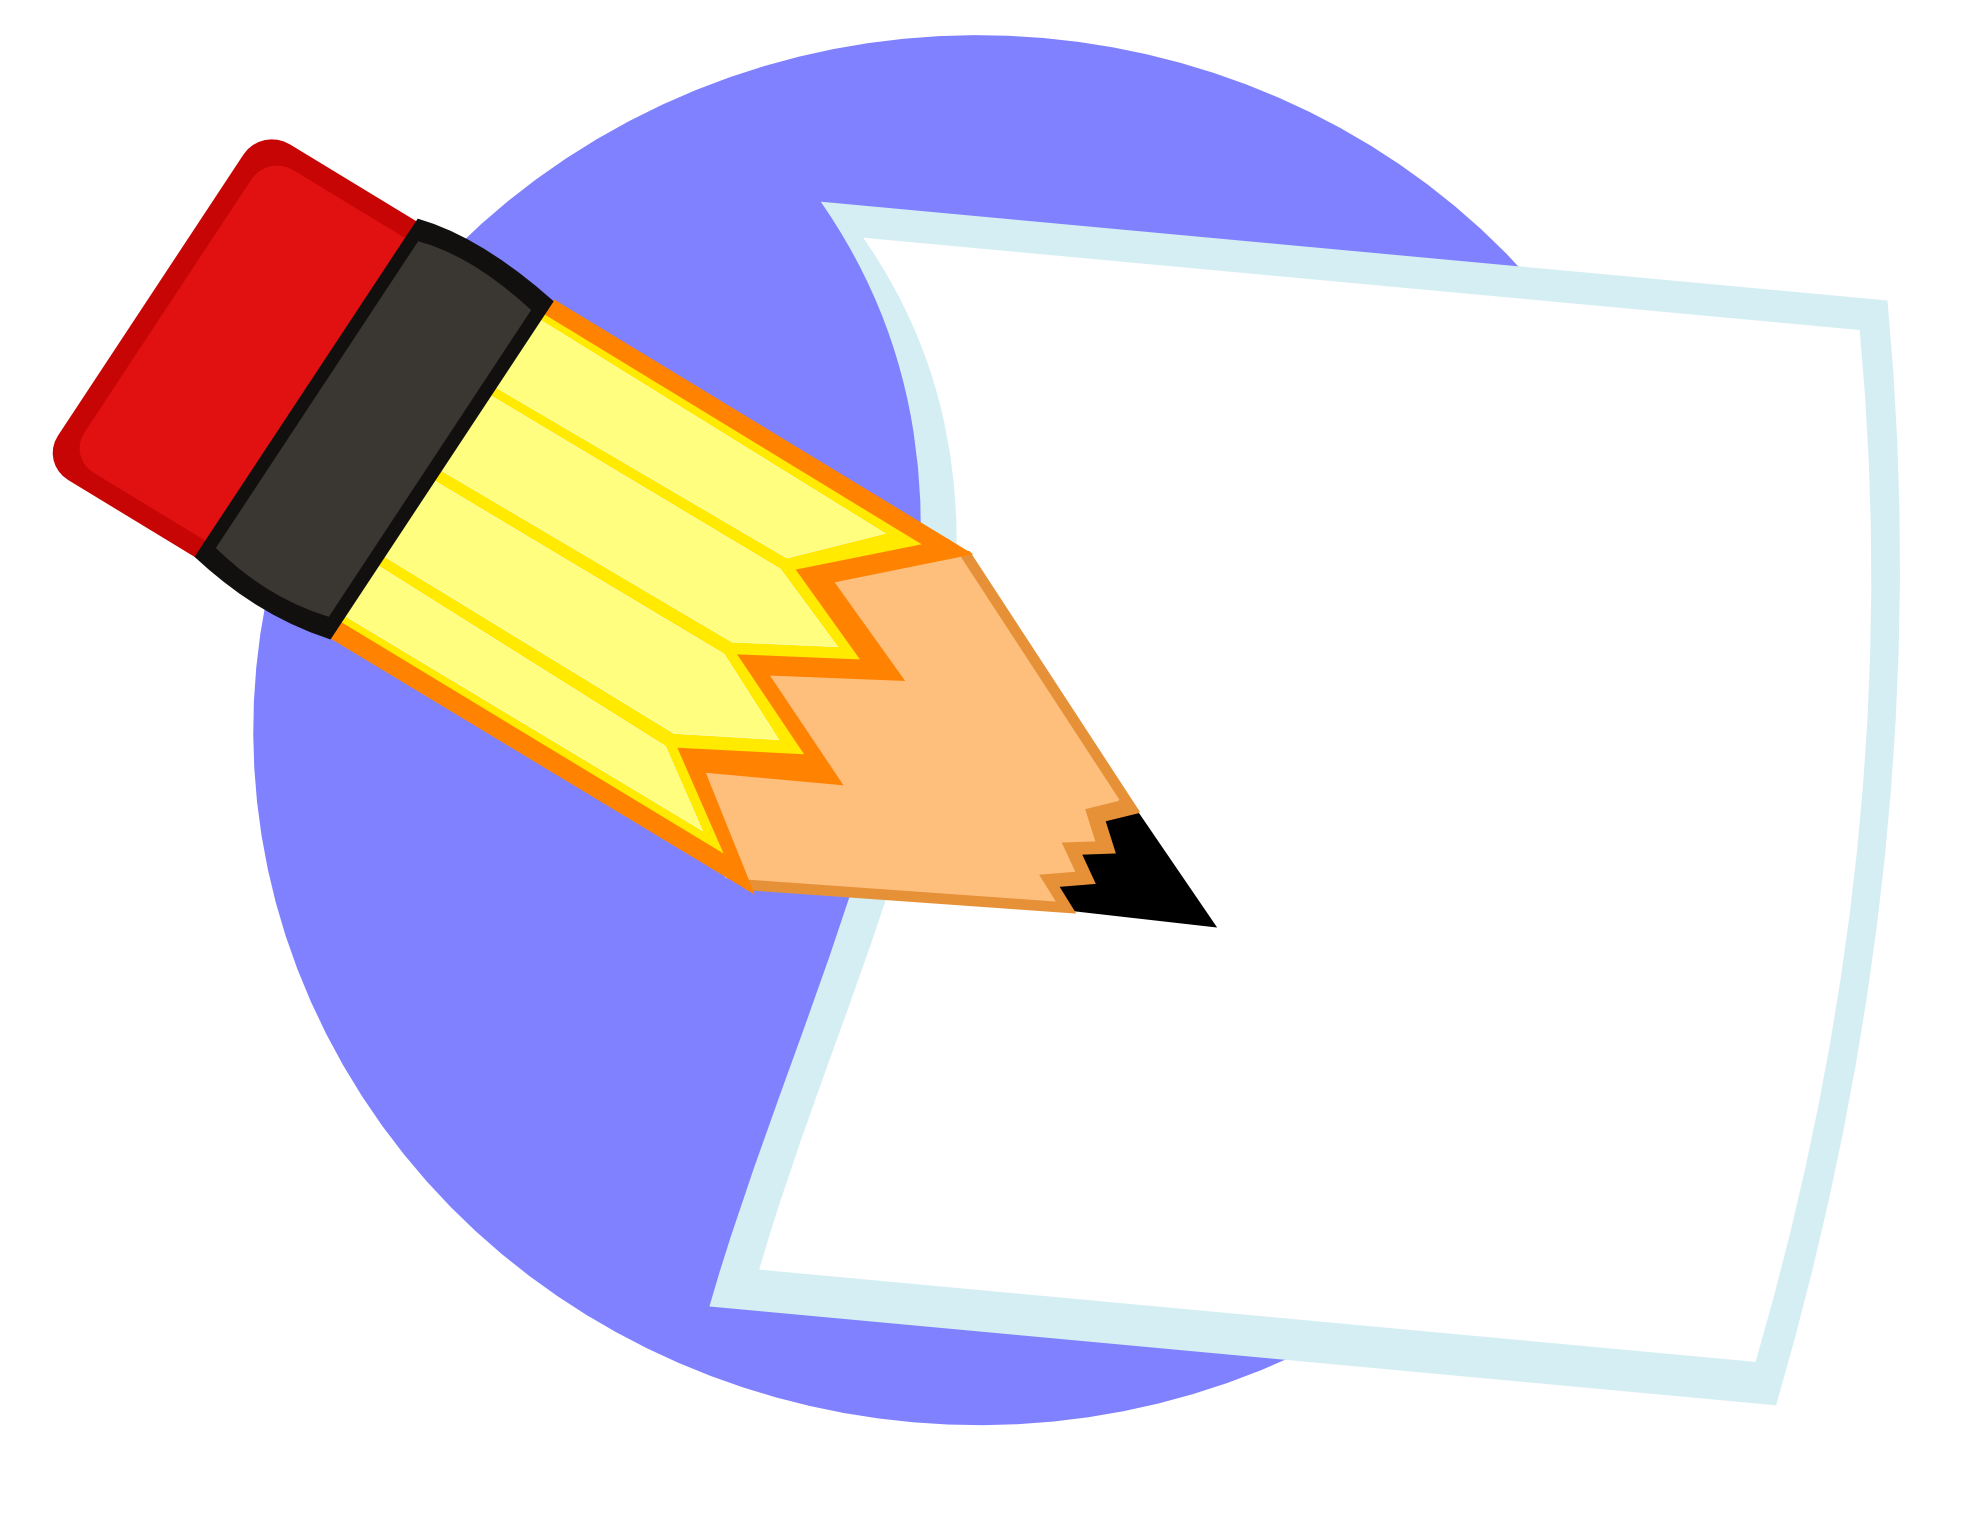 Paper And Pencil Clipart Dtre - Pencil And Paper Clip Art